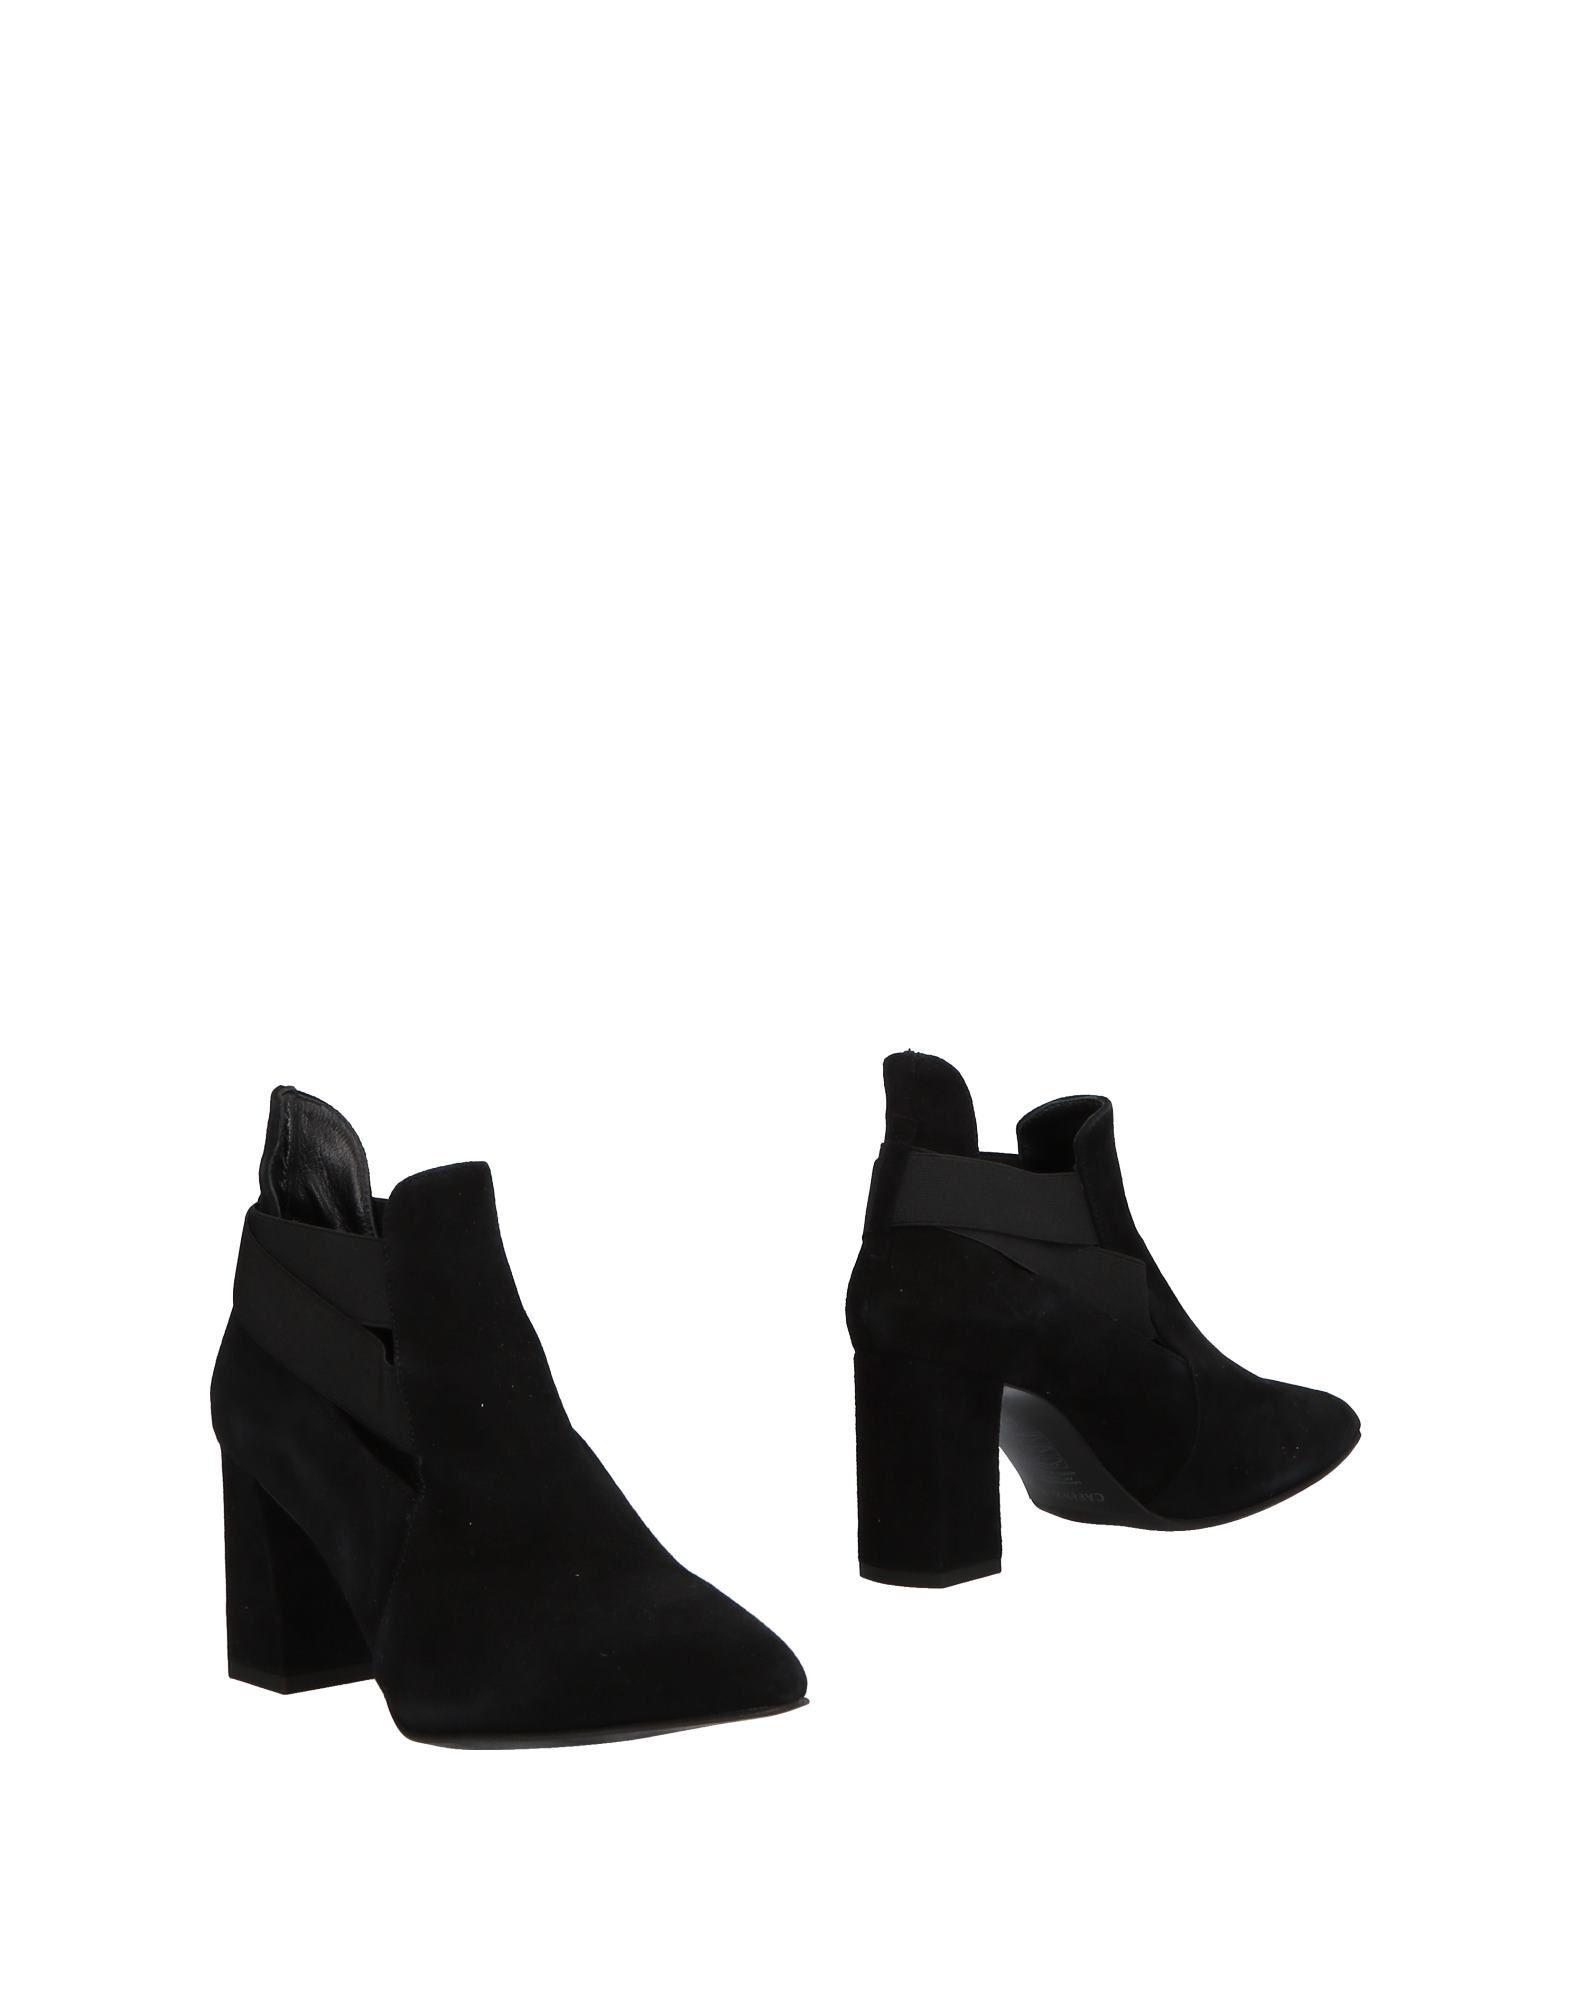 Cafènoir Stiefelette  Damen  Stiefelette 11497518LN Gute Qualität beliebte Schuhe 16159d